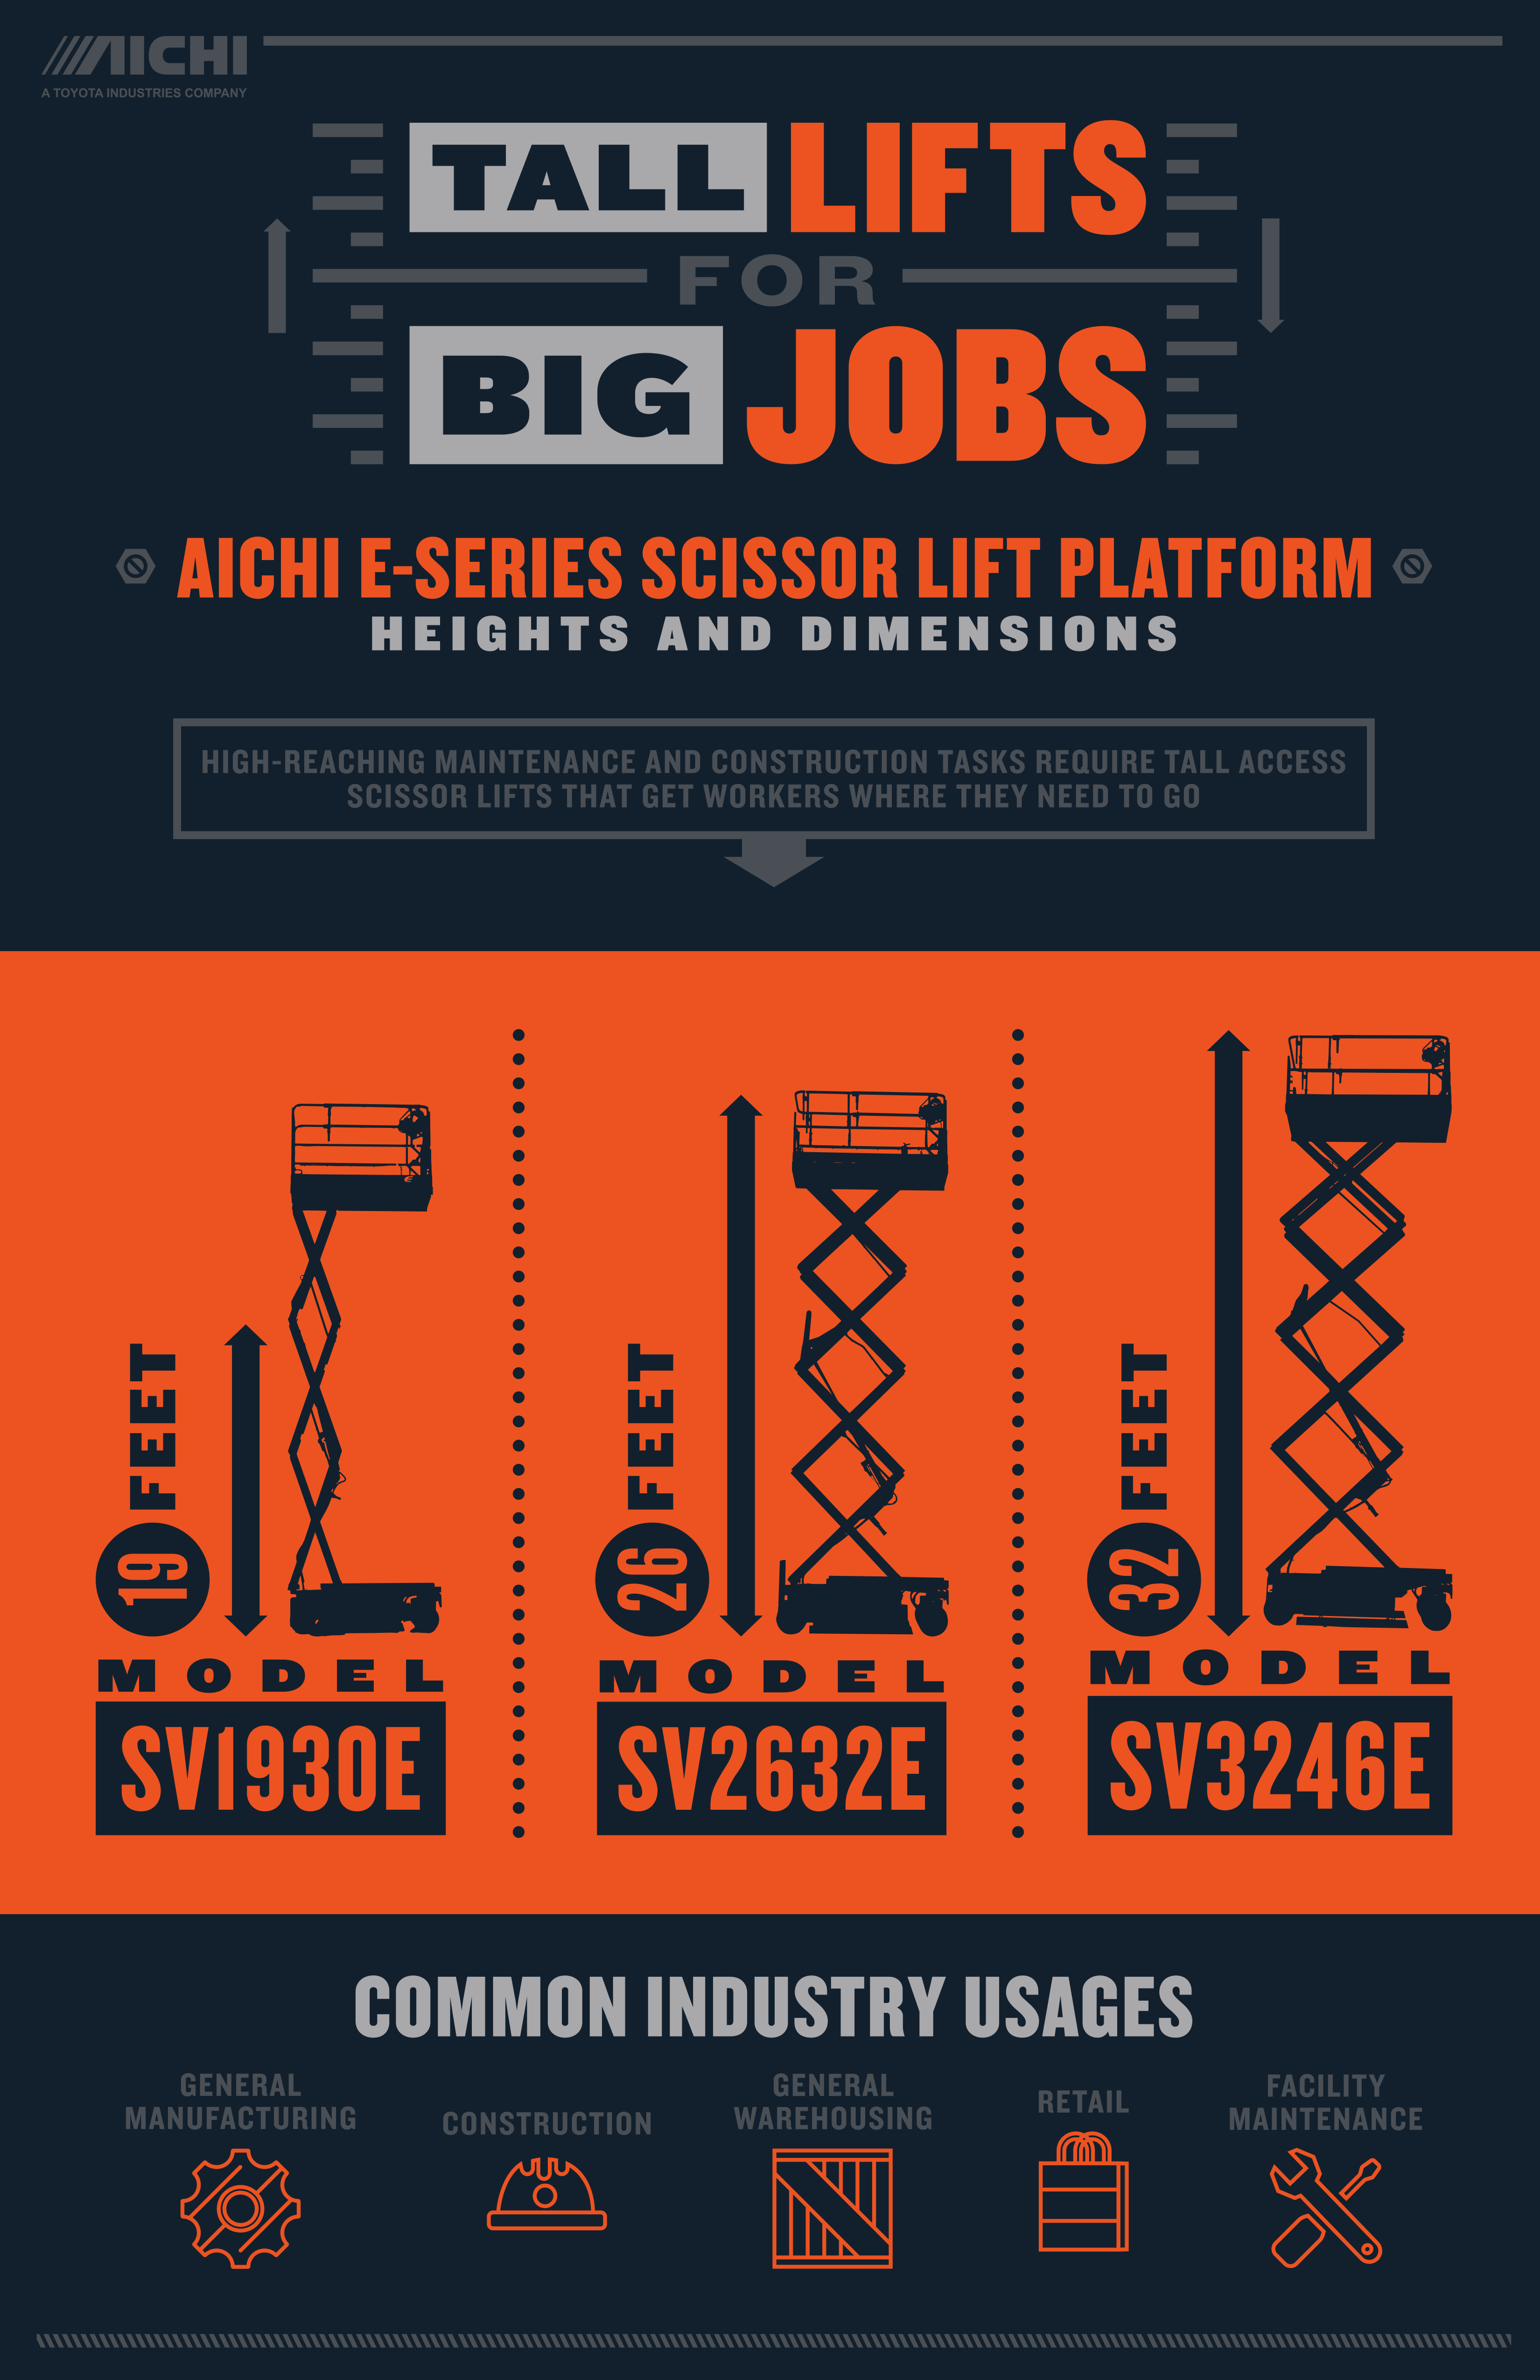 AICHI Scissor Lift Purchasing Factors | Toyota Forklifts